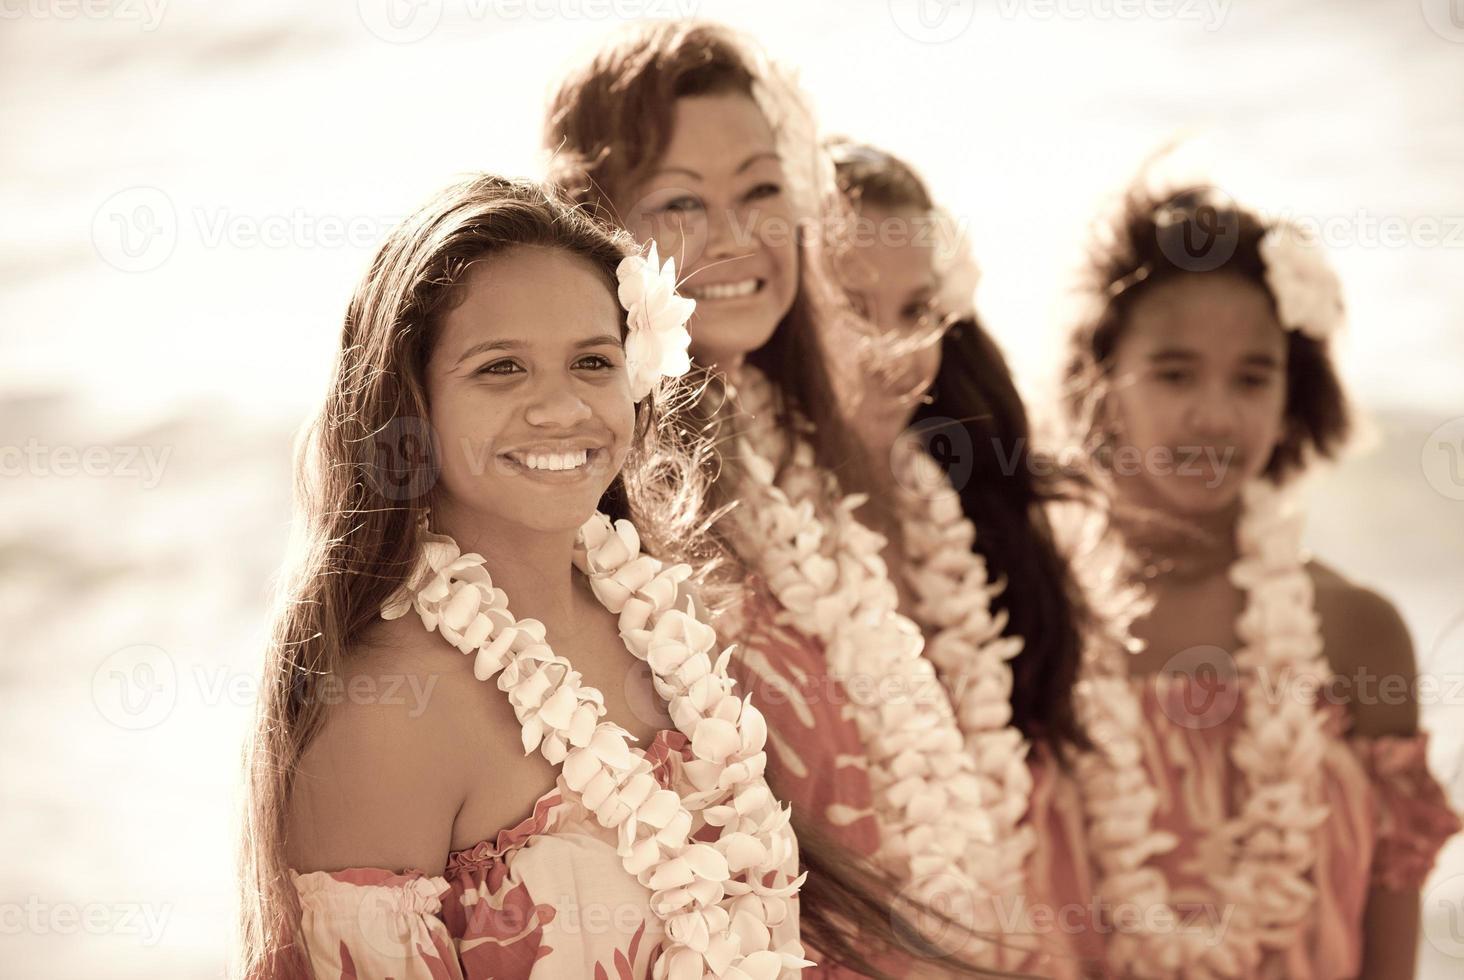 linda aloha dançarinos foto